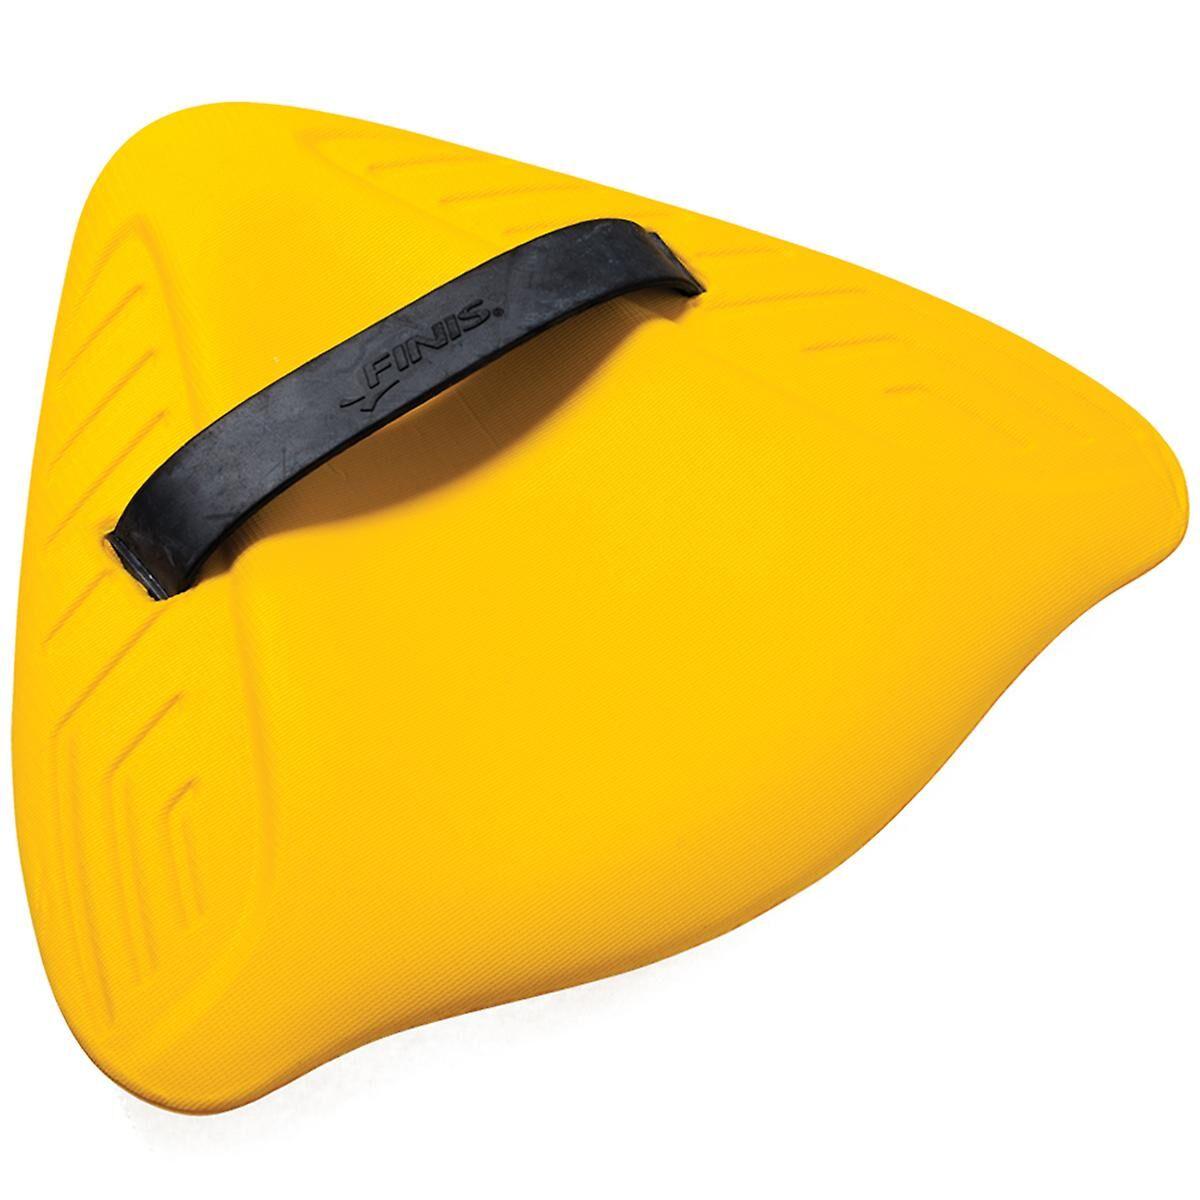 FINIS l'alignement natation planche - jaune